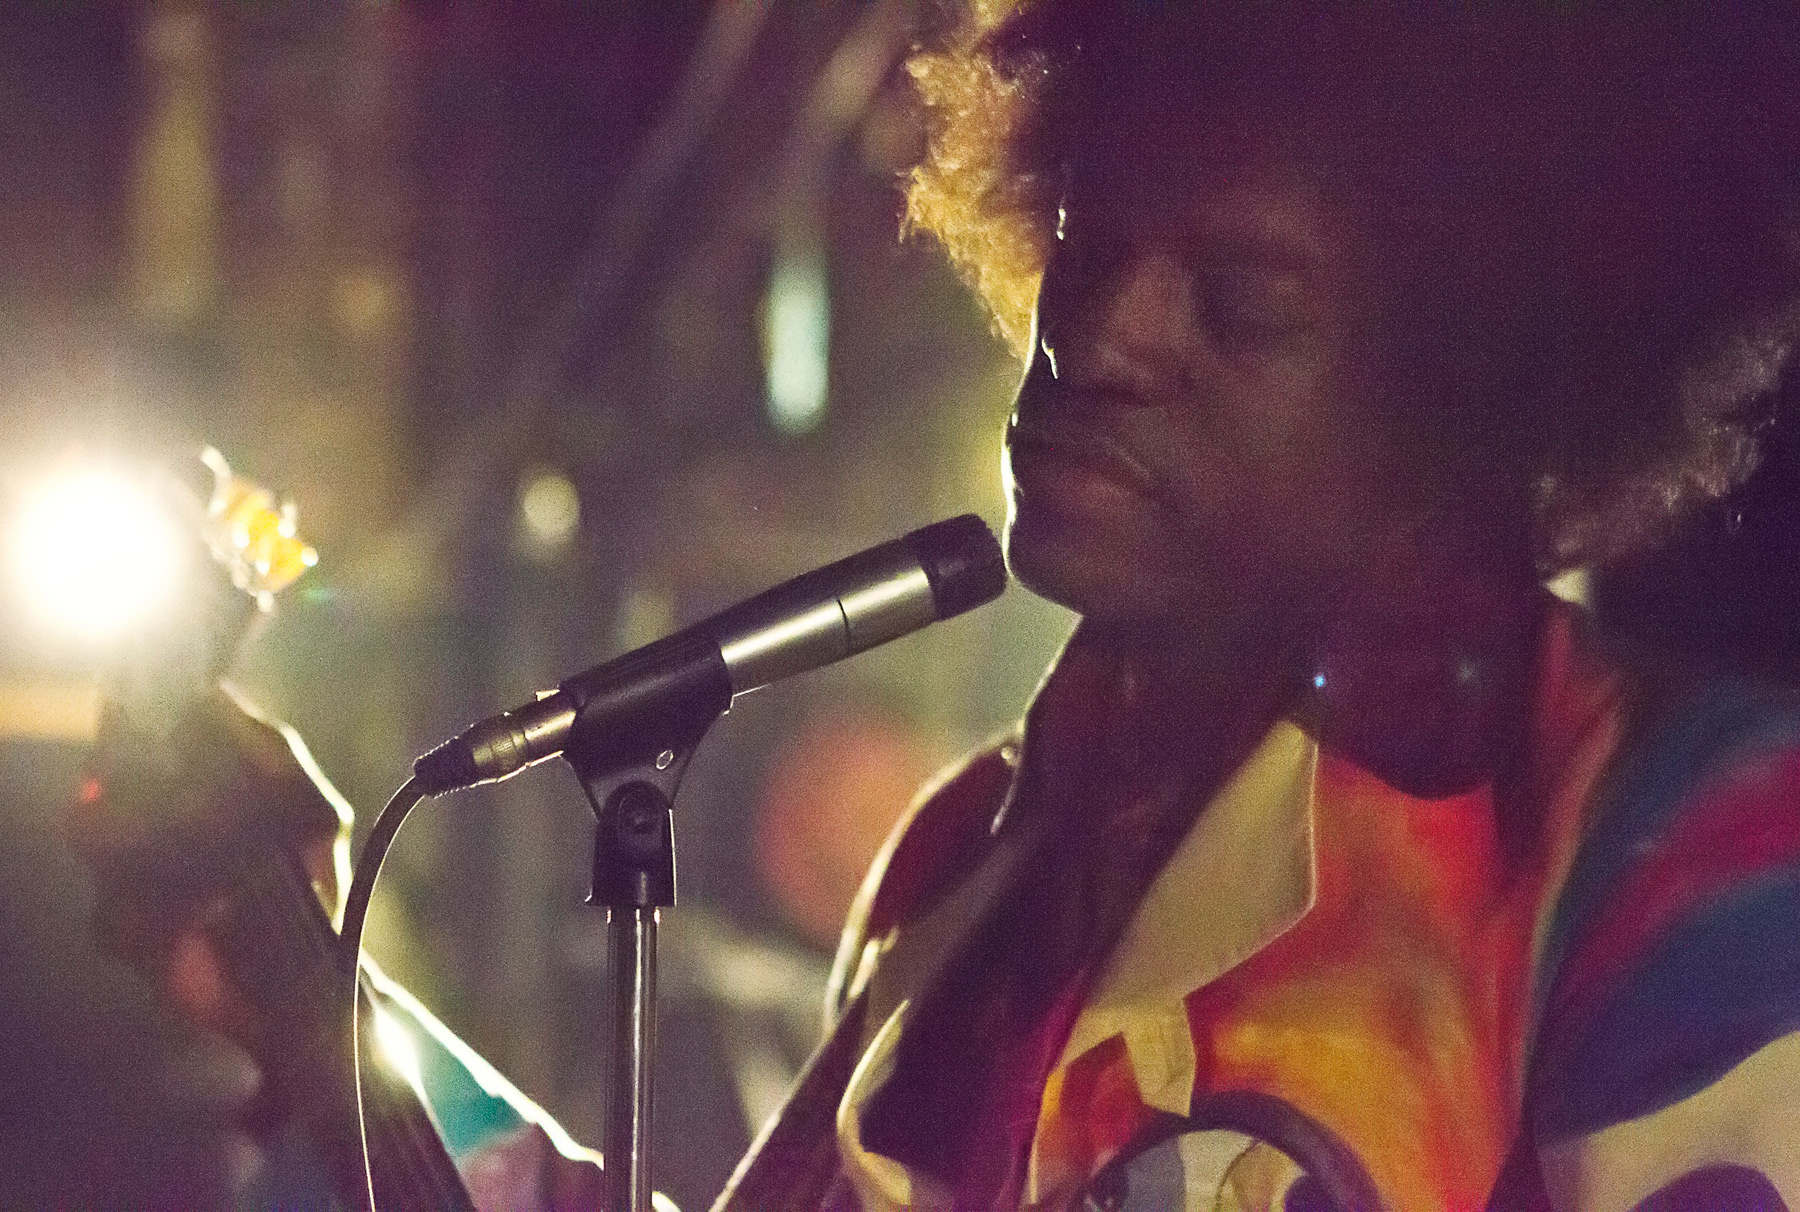 Jimi Hendrix Biopic Starring André 3000 Among SXSW 2014 Films